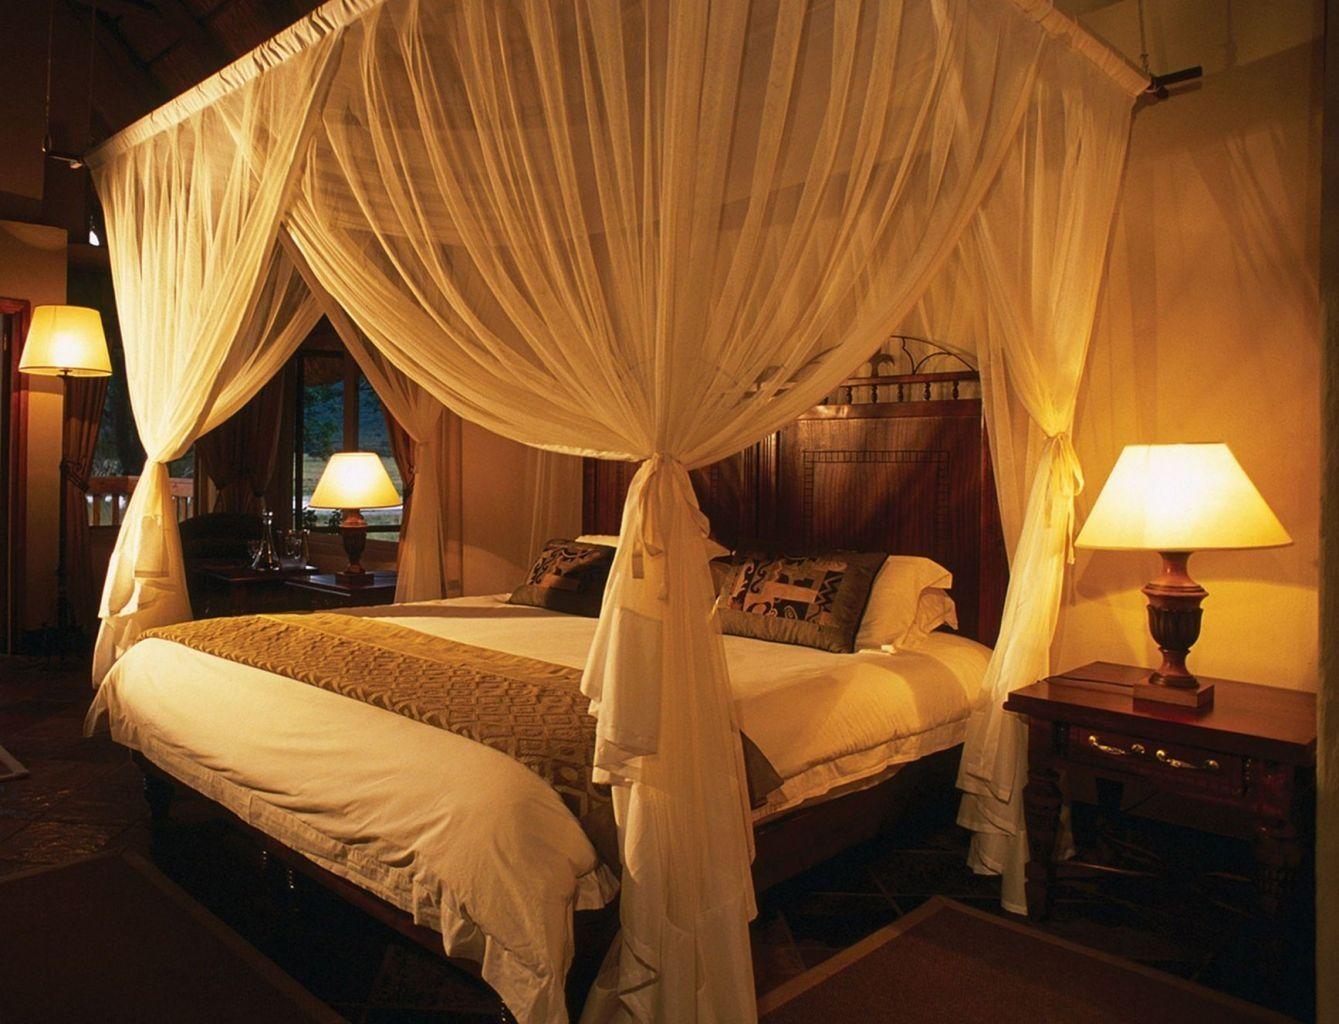 cool 49 amazing romantic master bedroom design ideas on a budget. Black Bedroom Furniture Sets. Home Design Ideas